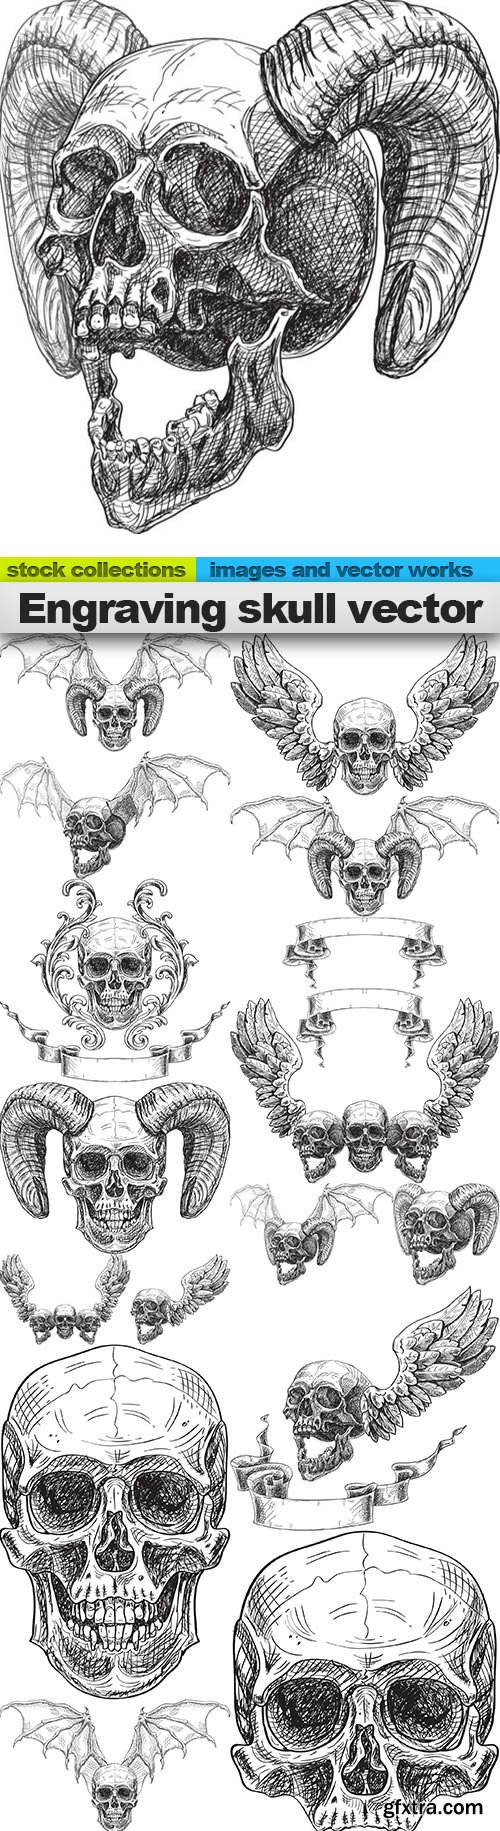 Engraving skull vector, 15 x EPS